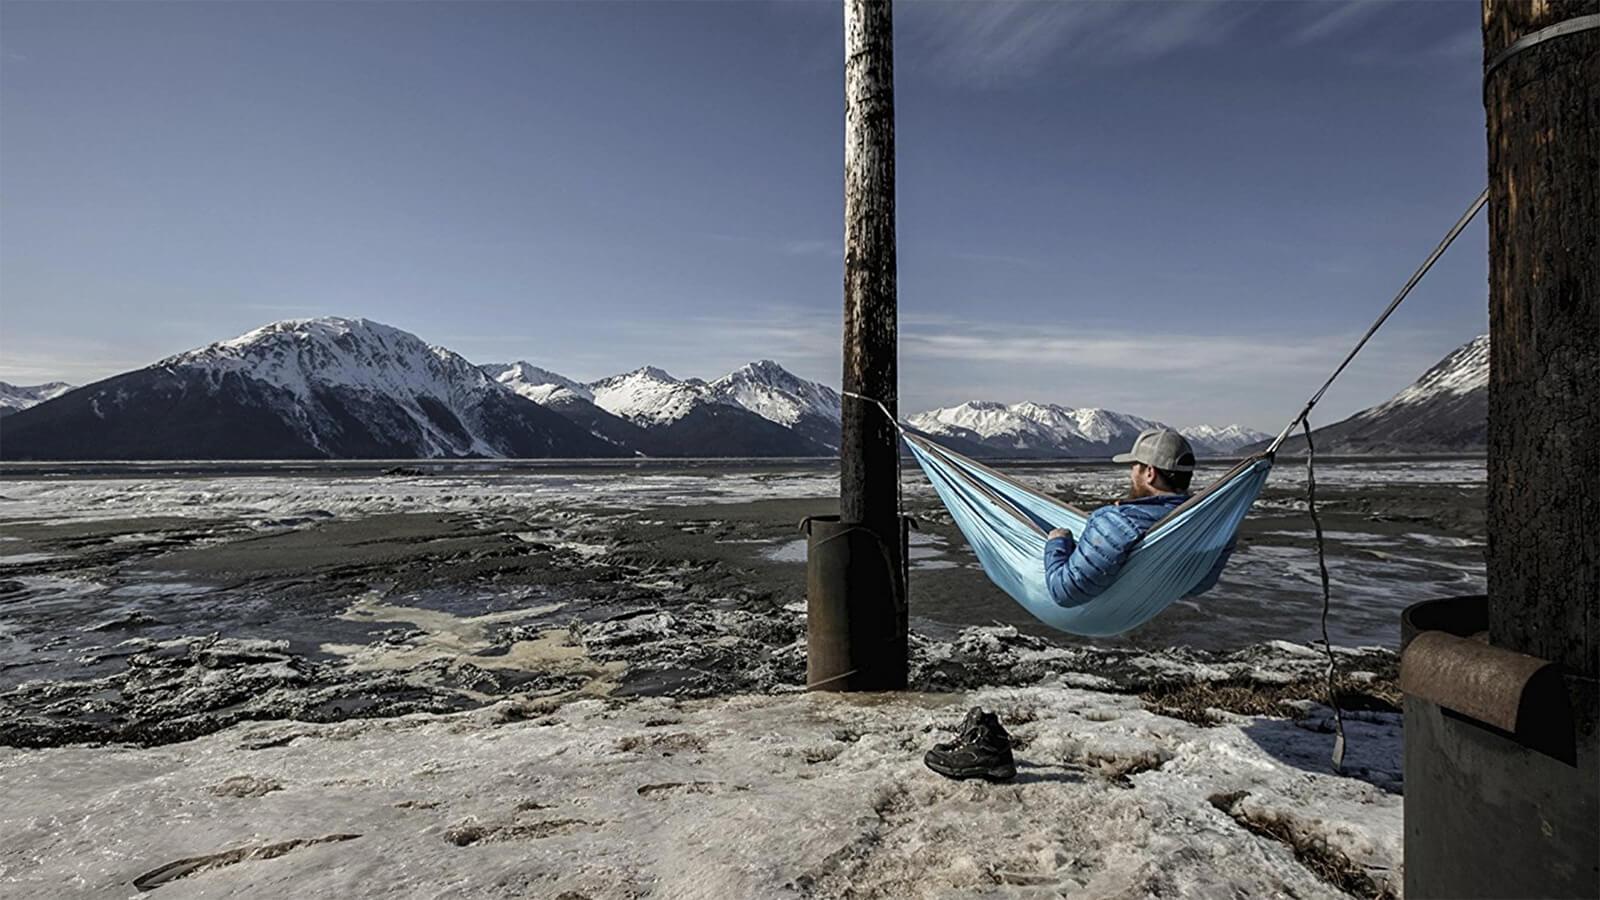 Every digital nomad needs the world's best hammock